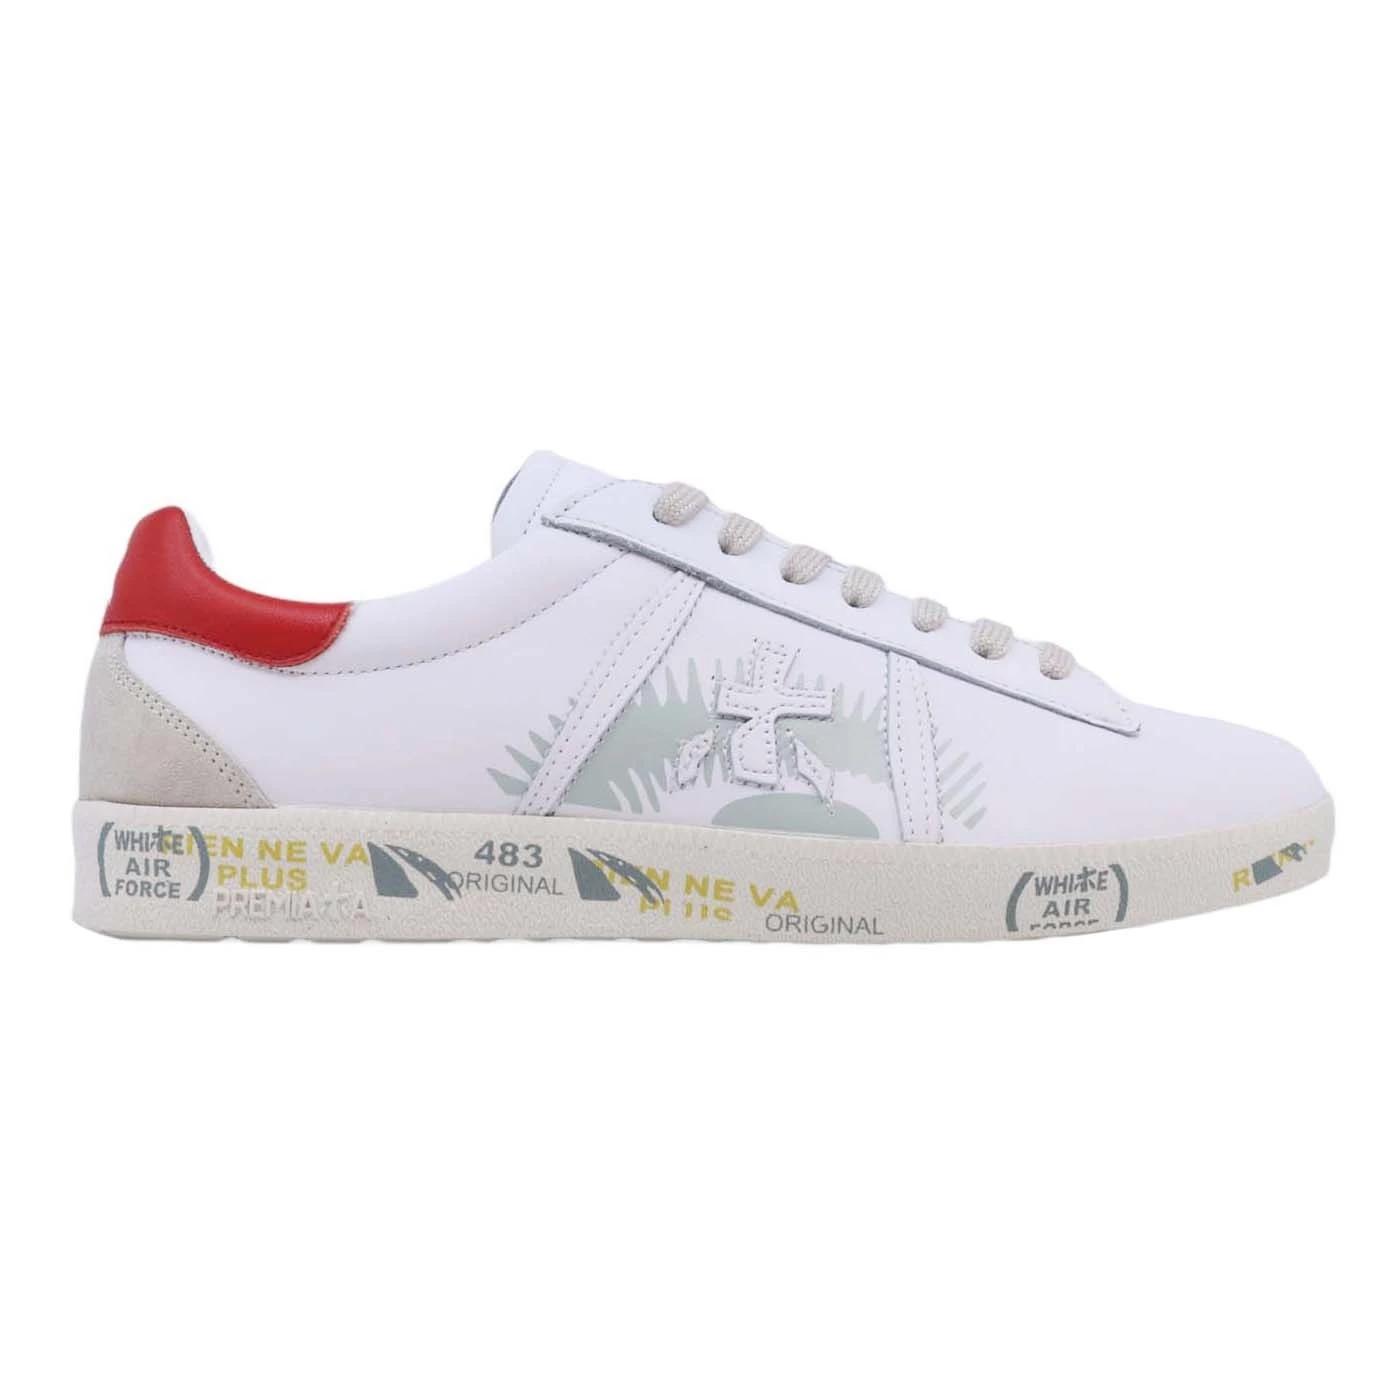 Premiata Andy 5144 sneaker da uomo in bianco